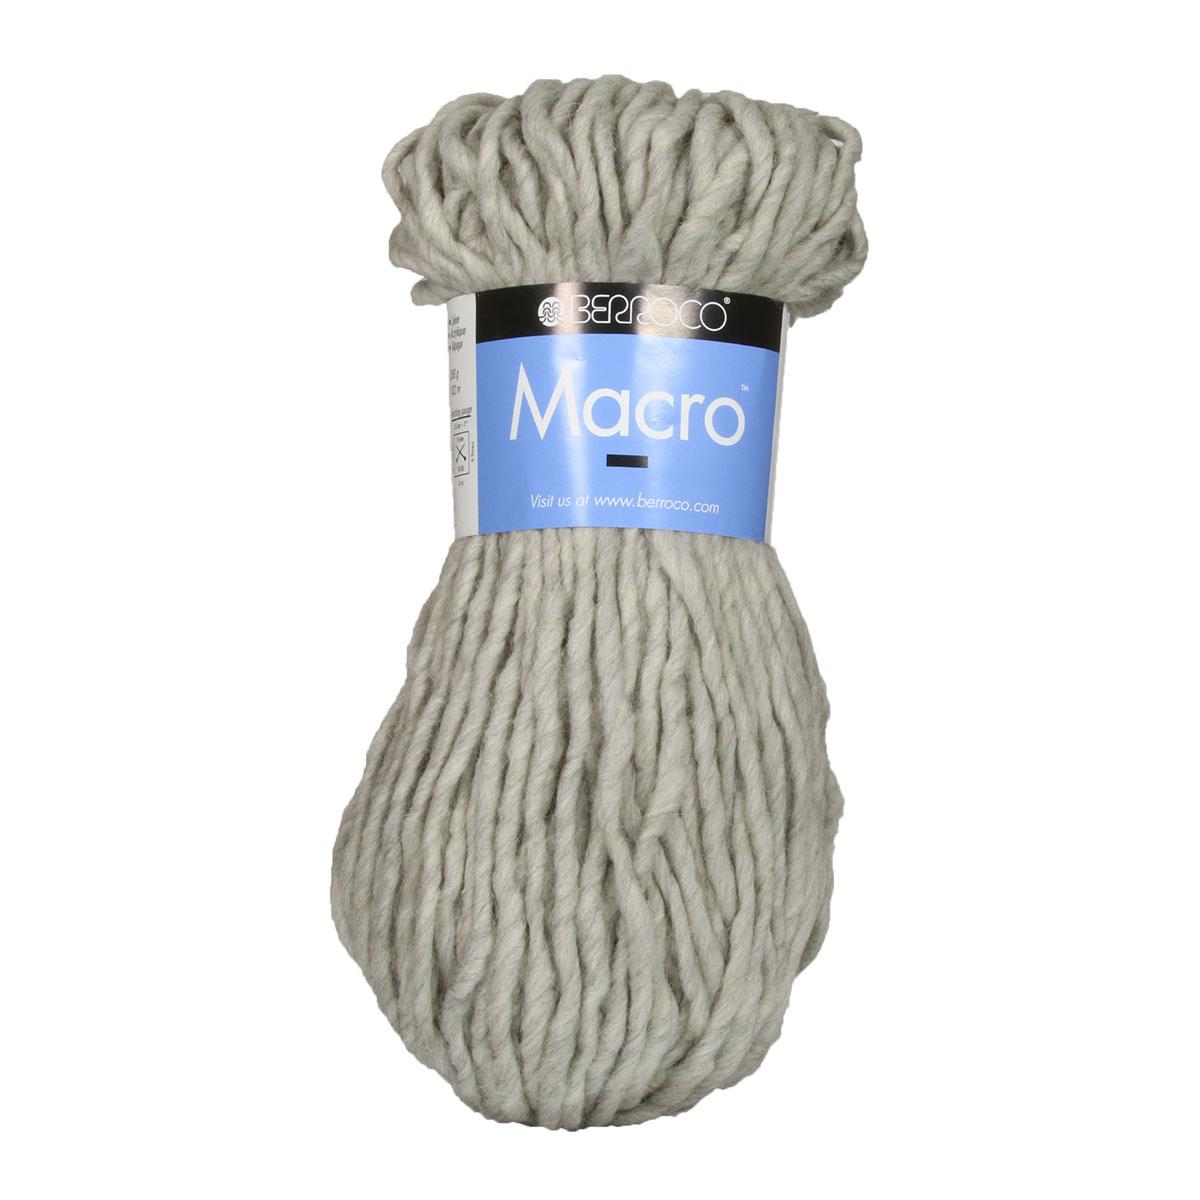 Berroco Macro Yarn - 6707 Beluga at Jimmy Beans Wool